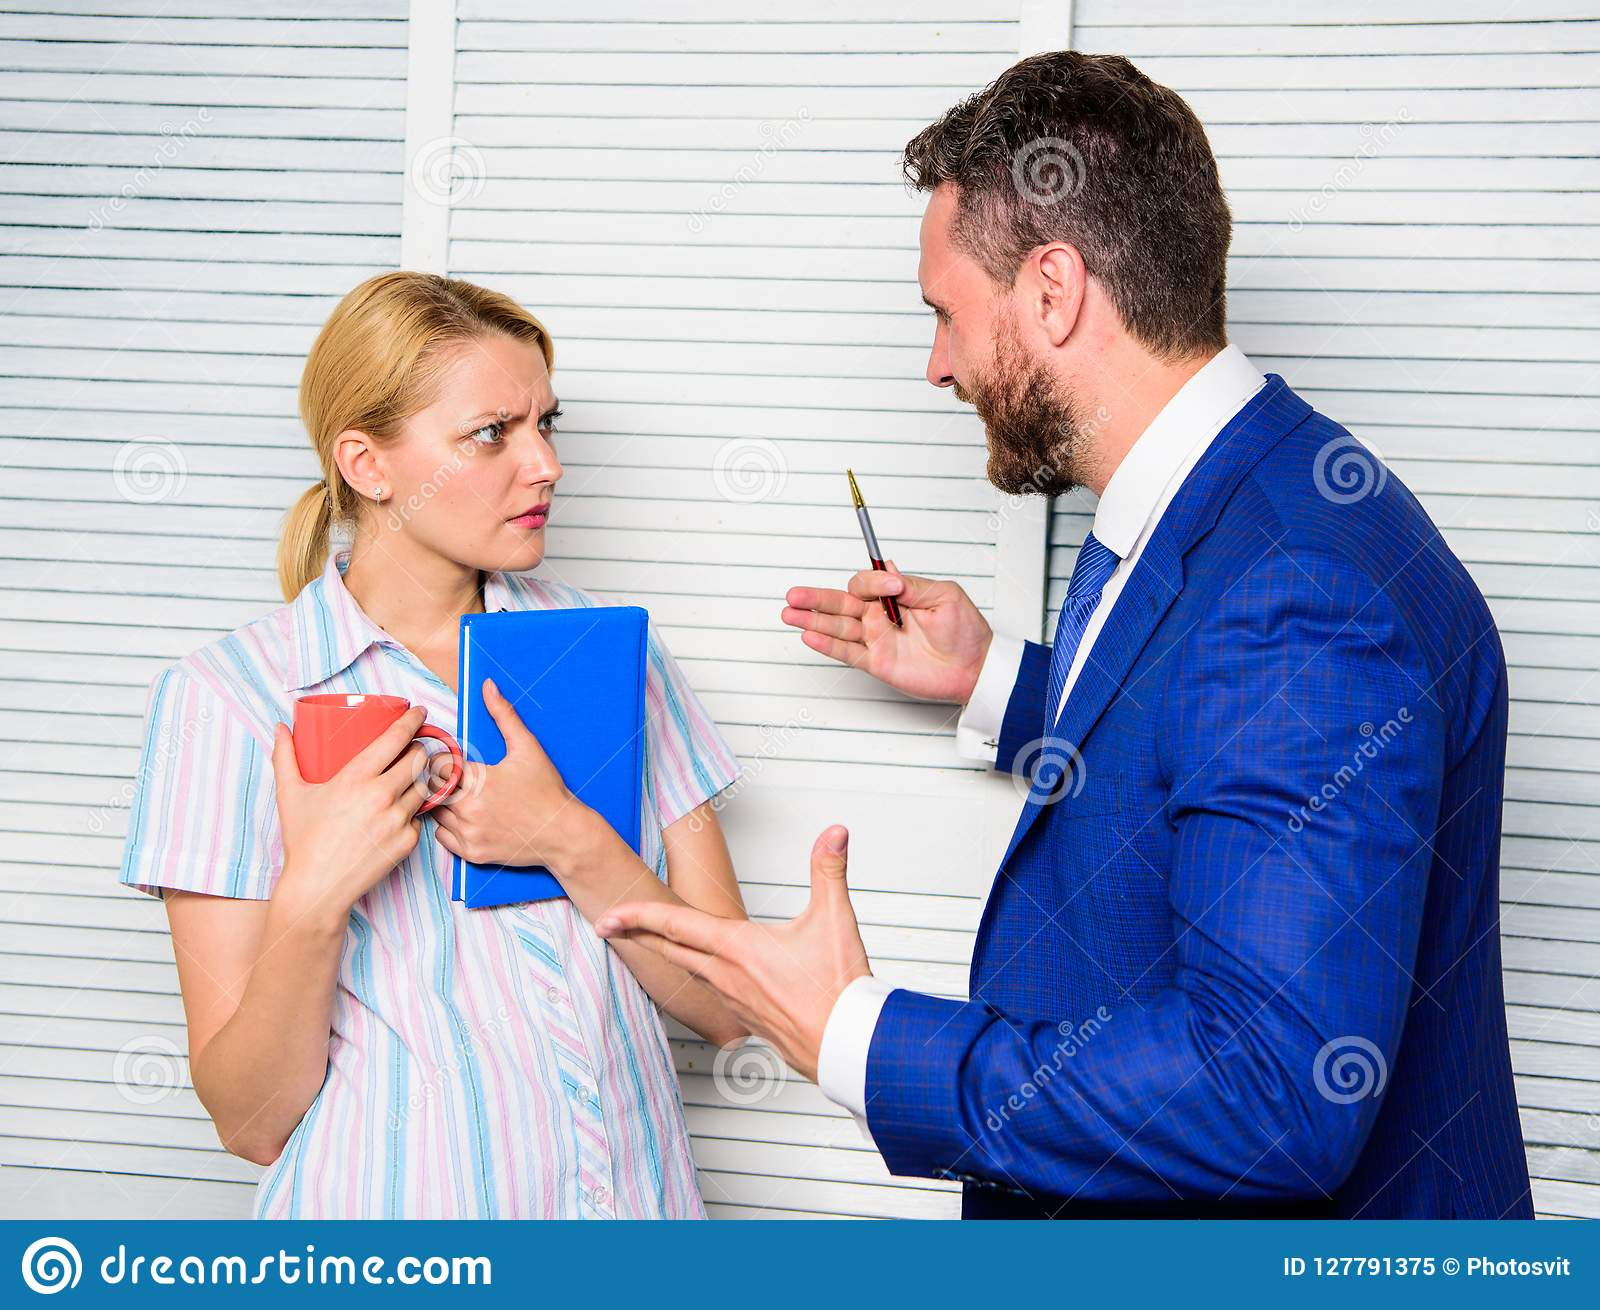 Office quarrel concept. Misunderstanding between colleagues. Prejudice and personal attitude to employee. Tense